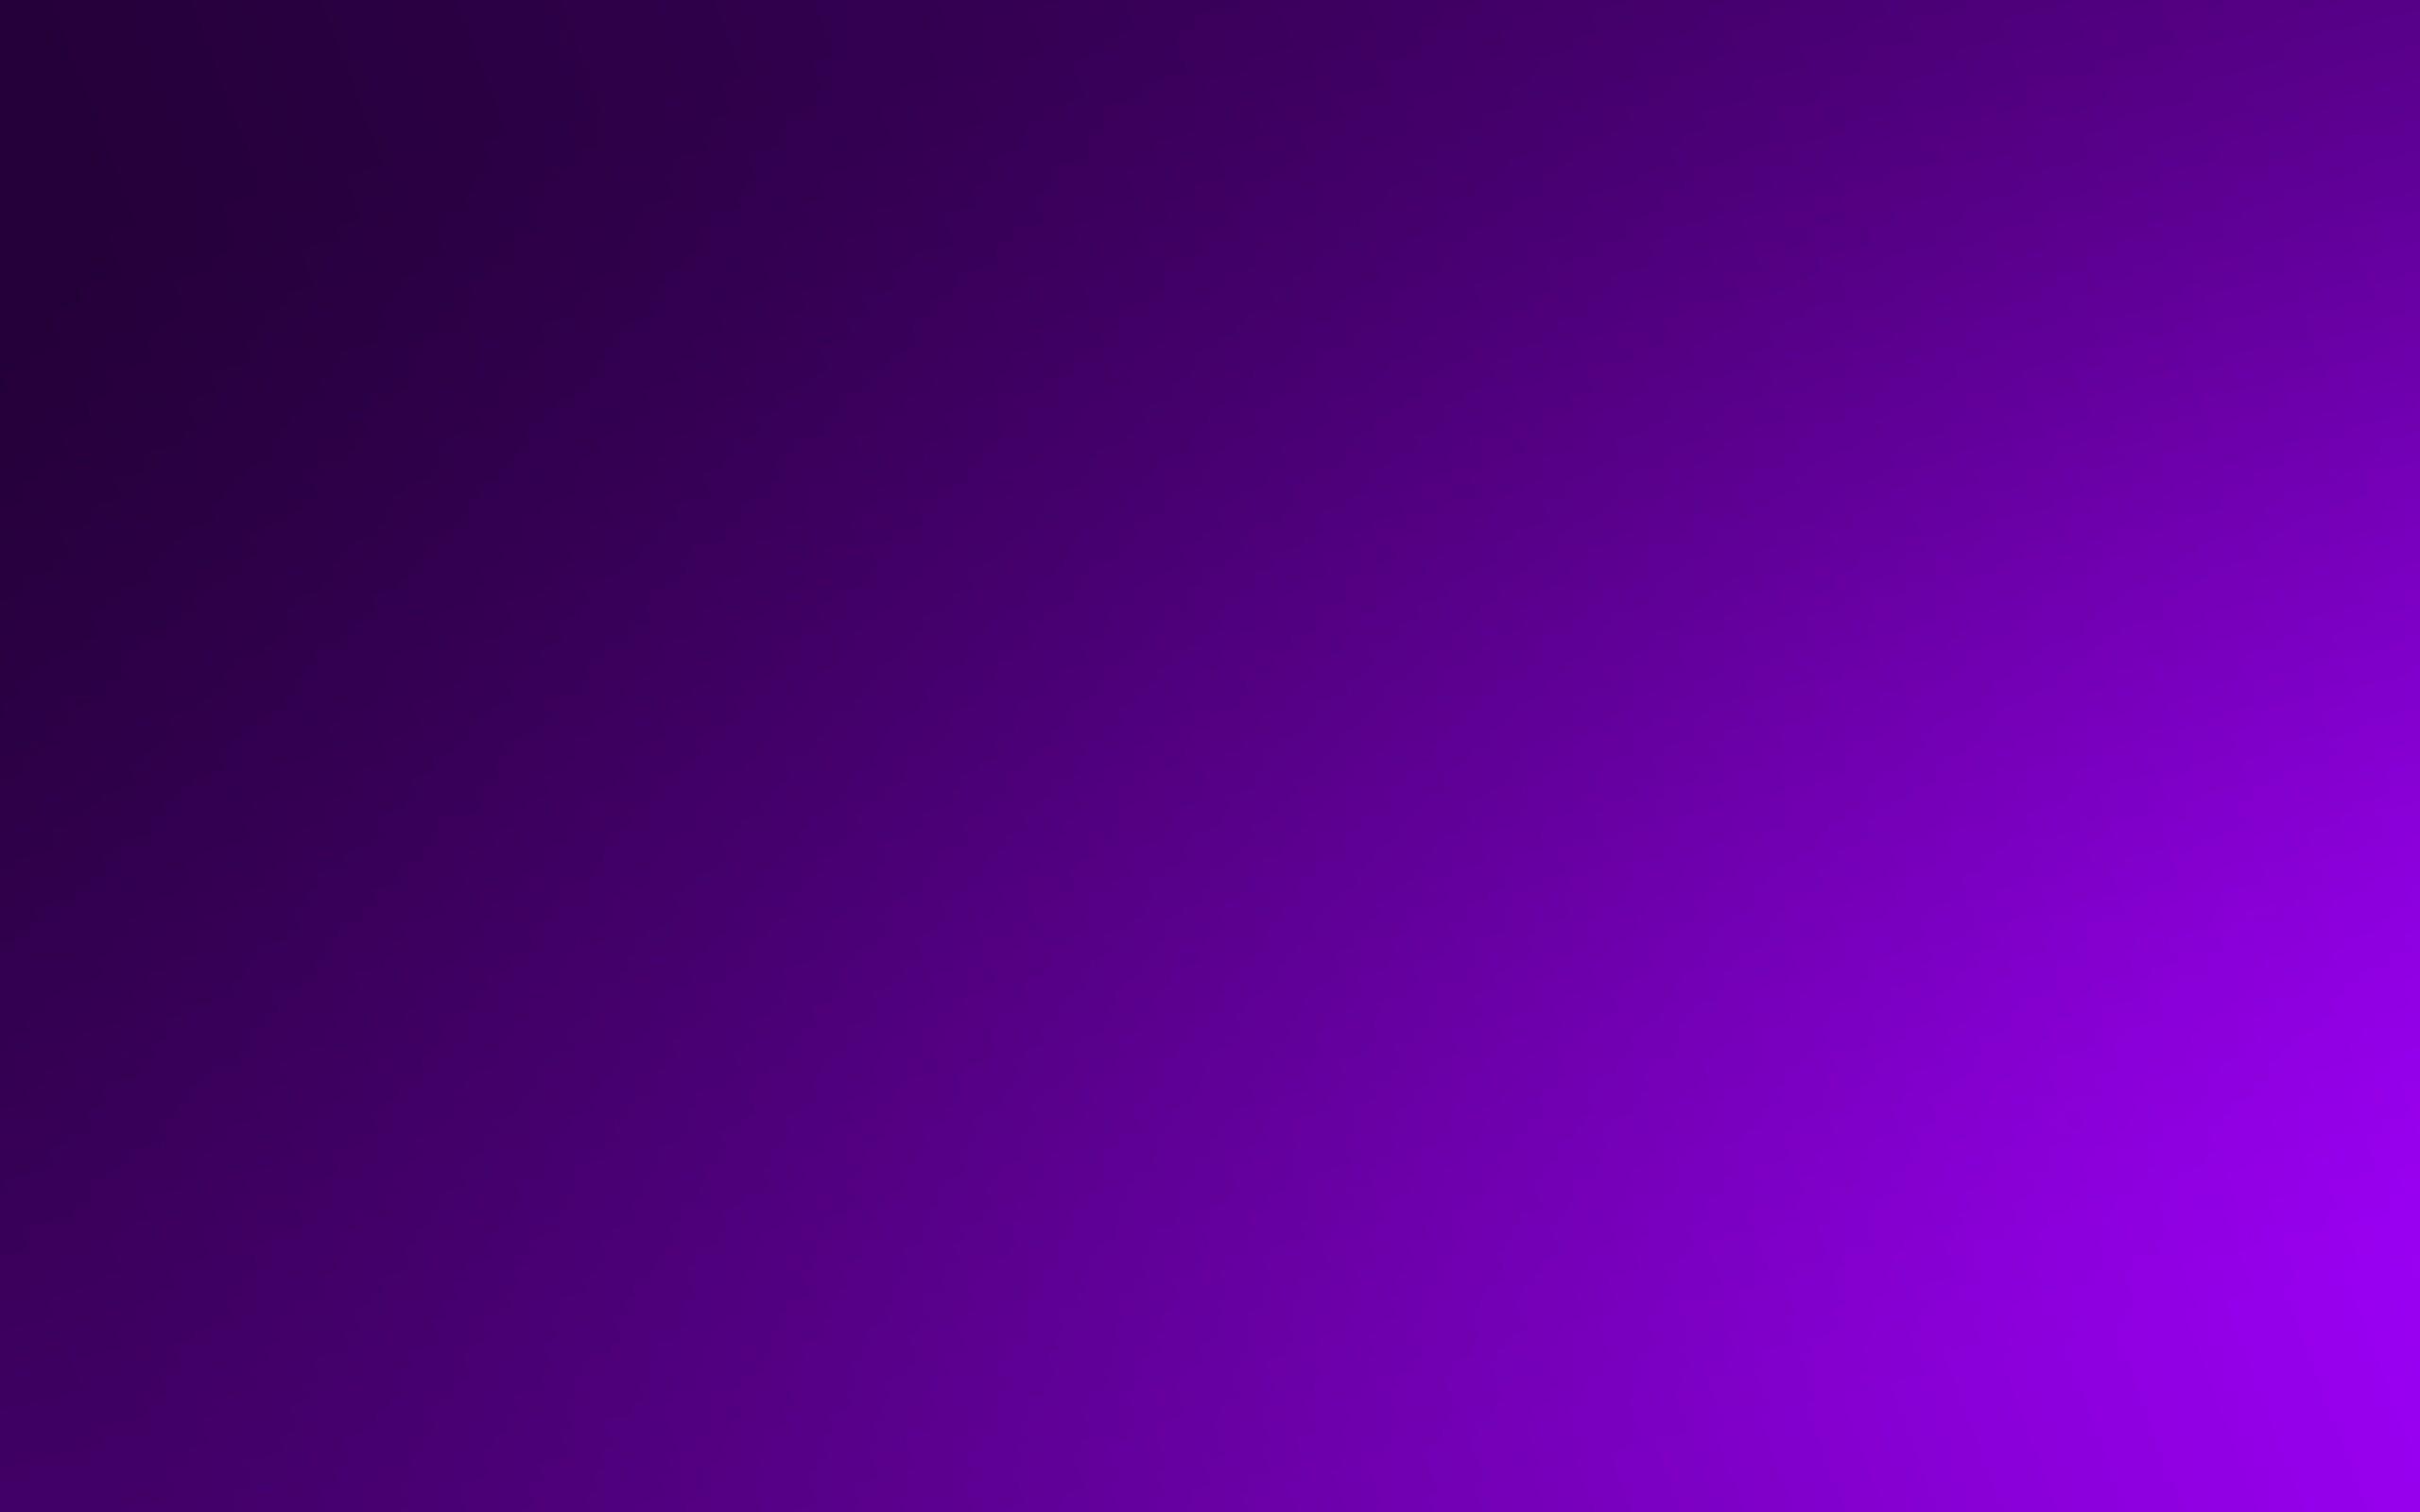 Purple Solid Background wallpaper – 1014158